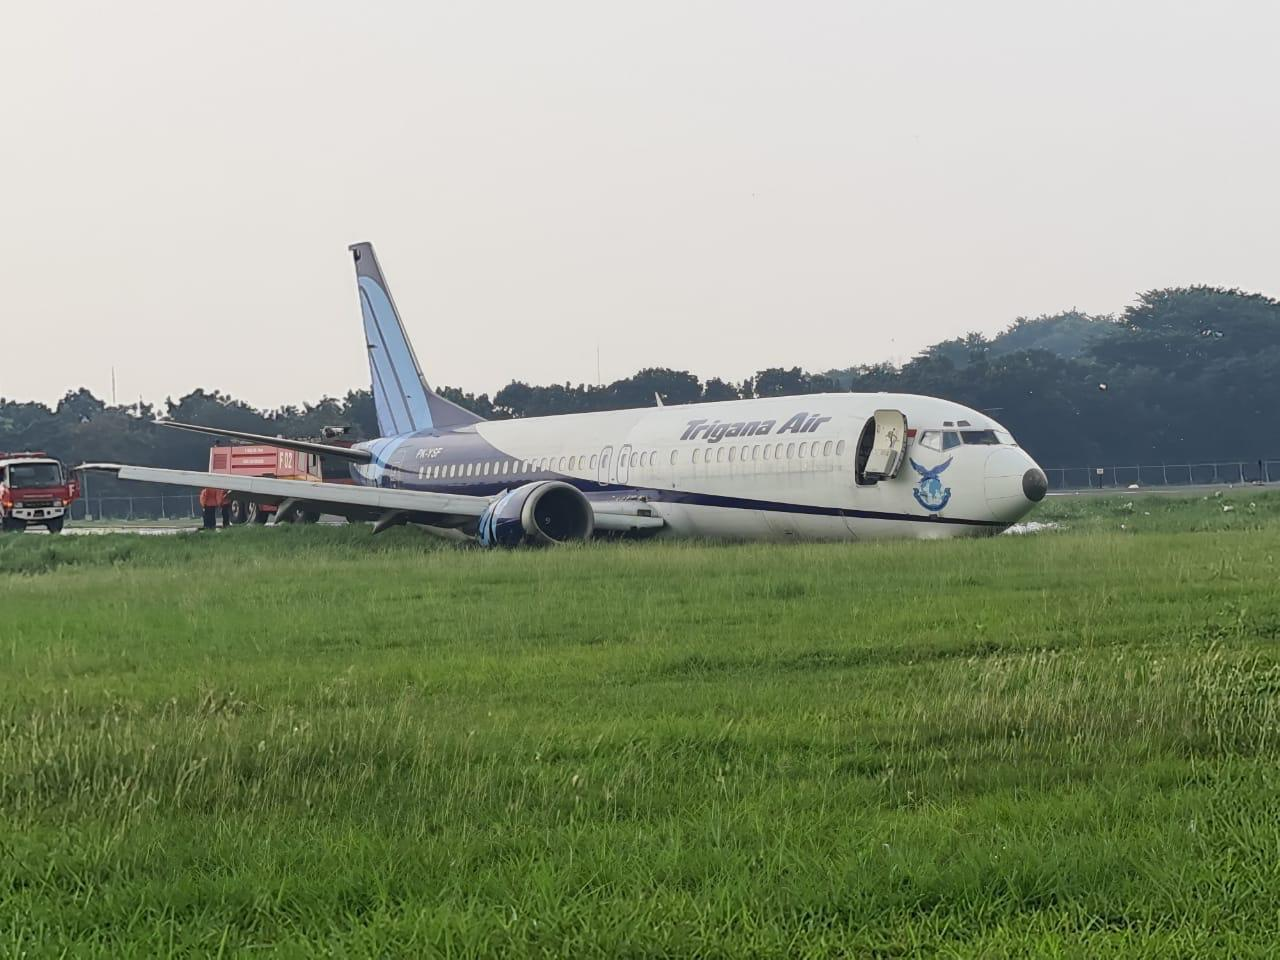 https: img.okezone.com content 2021 03 20 337 2381137 trigana-air-tergelincir-di-bandara-halim-7-penerbangan-tertunda-dan-dialihkan-ke-soetta-n92xb7sQUw.jpg